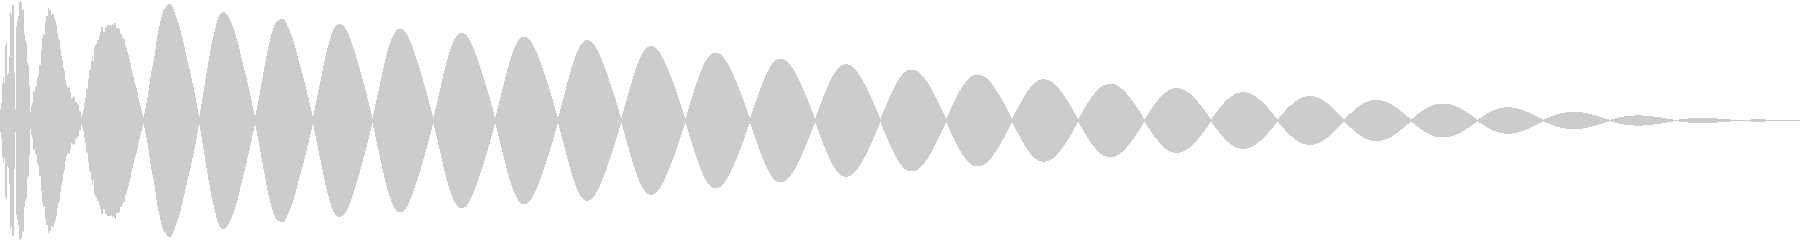 DTM Kick 95 オリジナル音源の未再生の波形